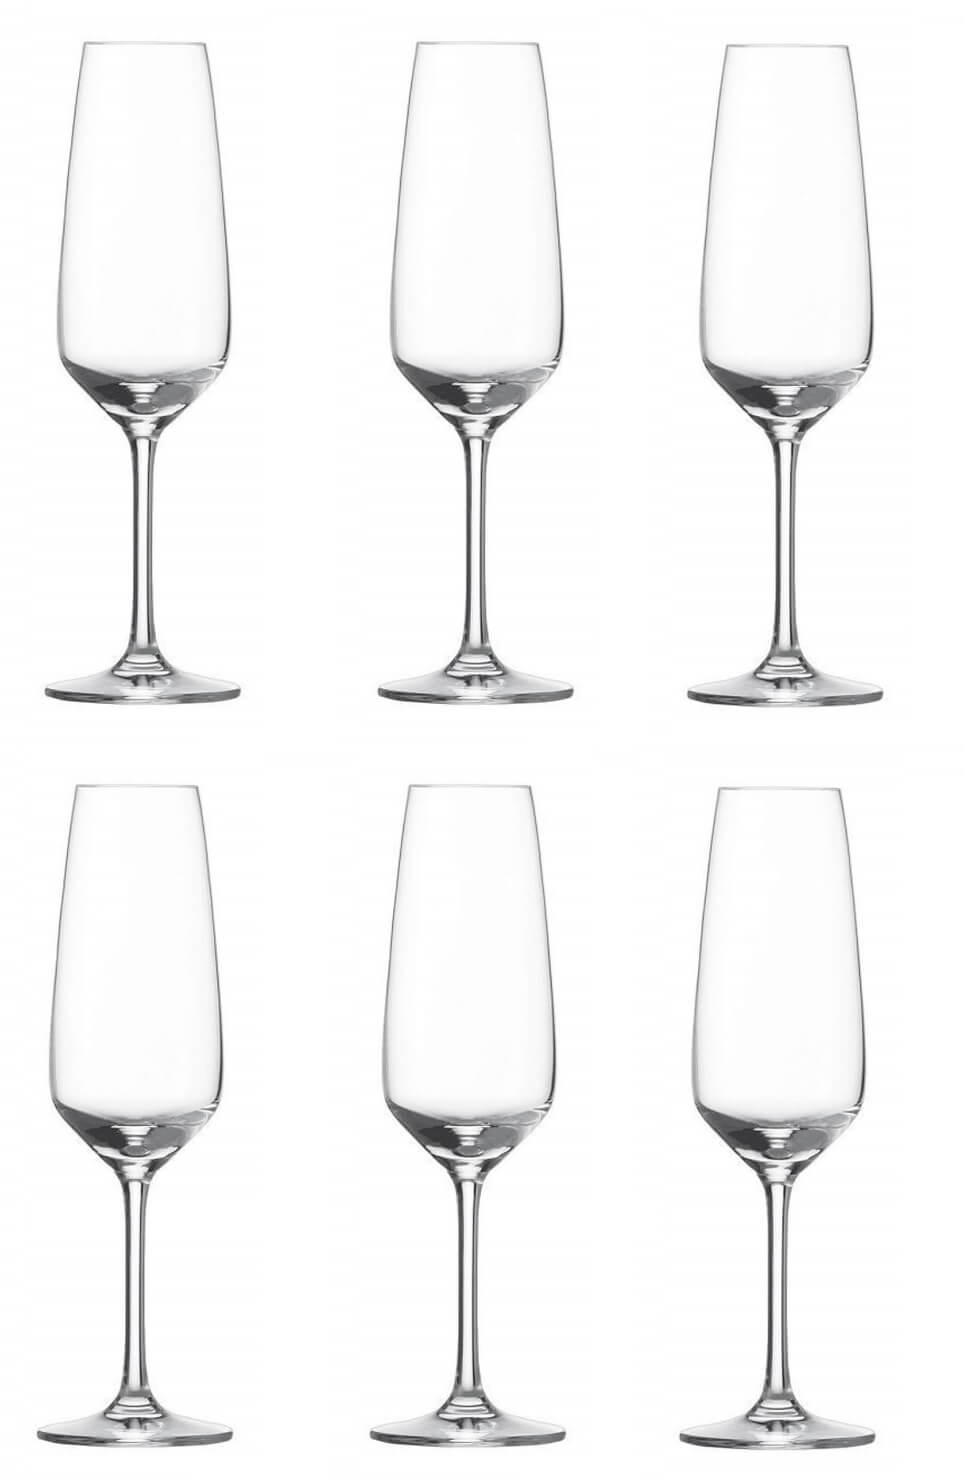 Онлайн каталог PROMENU: Набор бокалов для шампанского Schott Zwiesel Taste, объем 0,283 л, 6 шт.                               115674_6шт